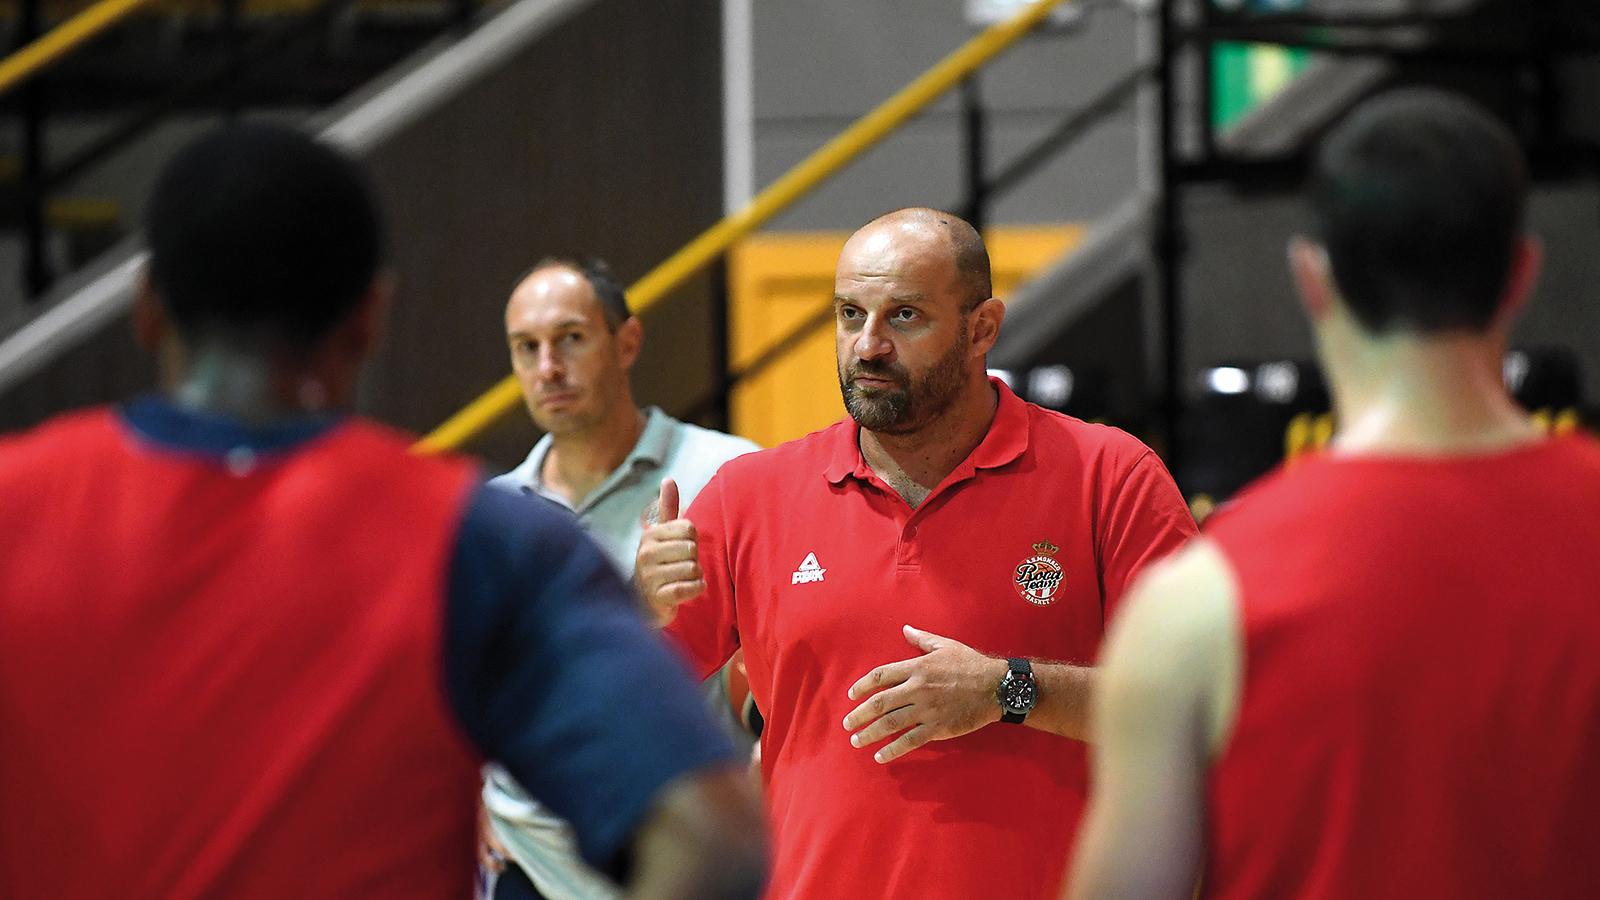 Zvezdan-Mitrovic-entraineur-ASM-Basket-@-DirCom-MAN_8604